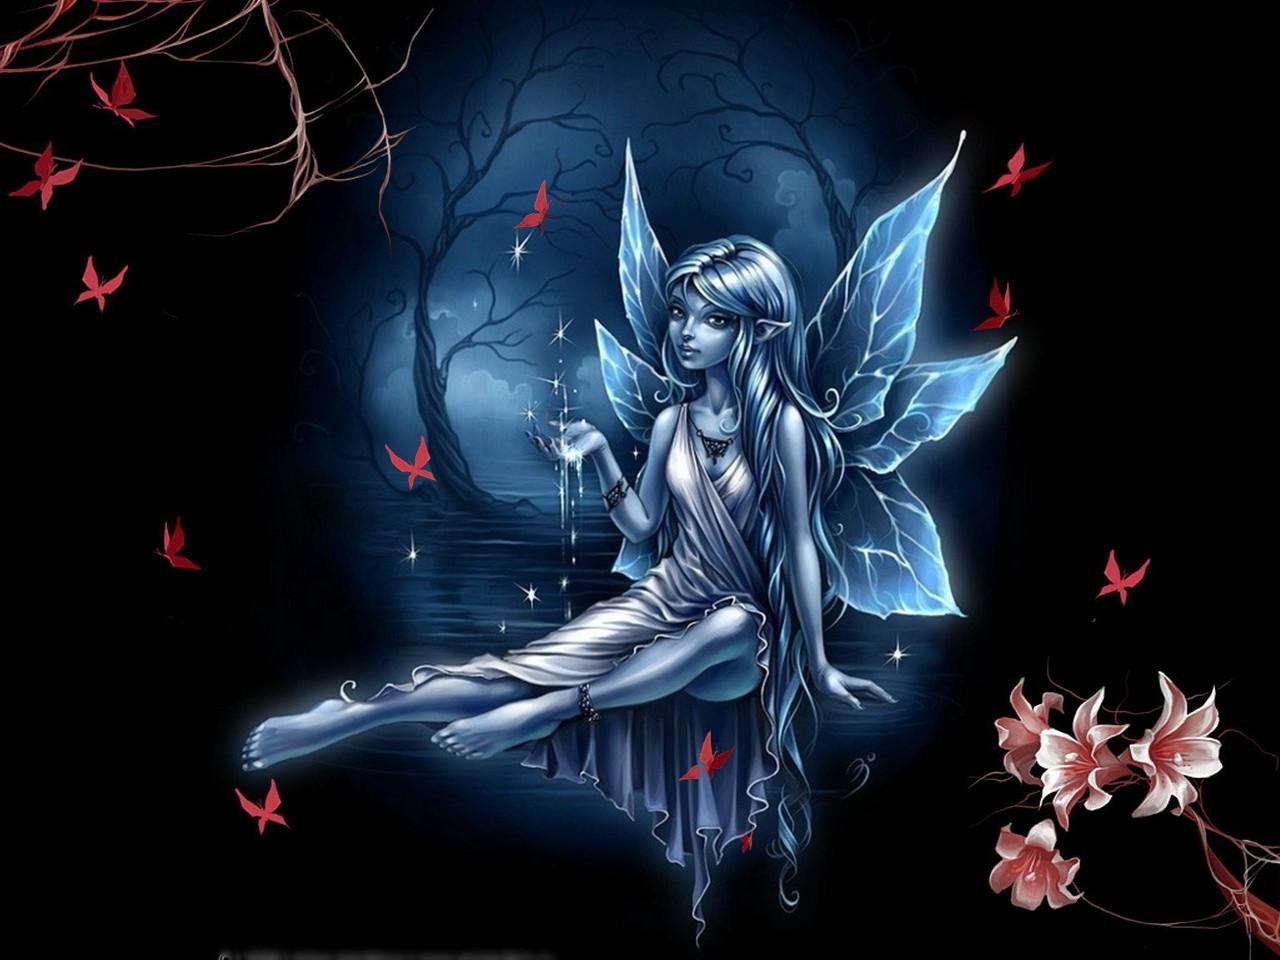 desktop fairy wallpaper Wallpaper and Screensaver 1280x960